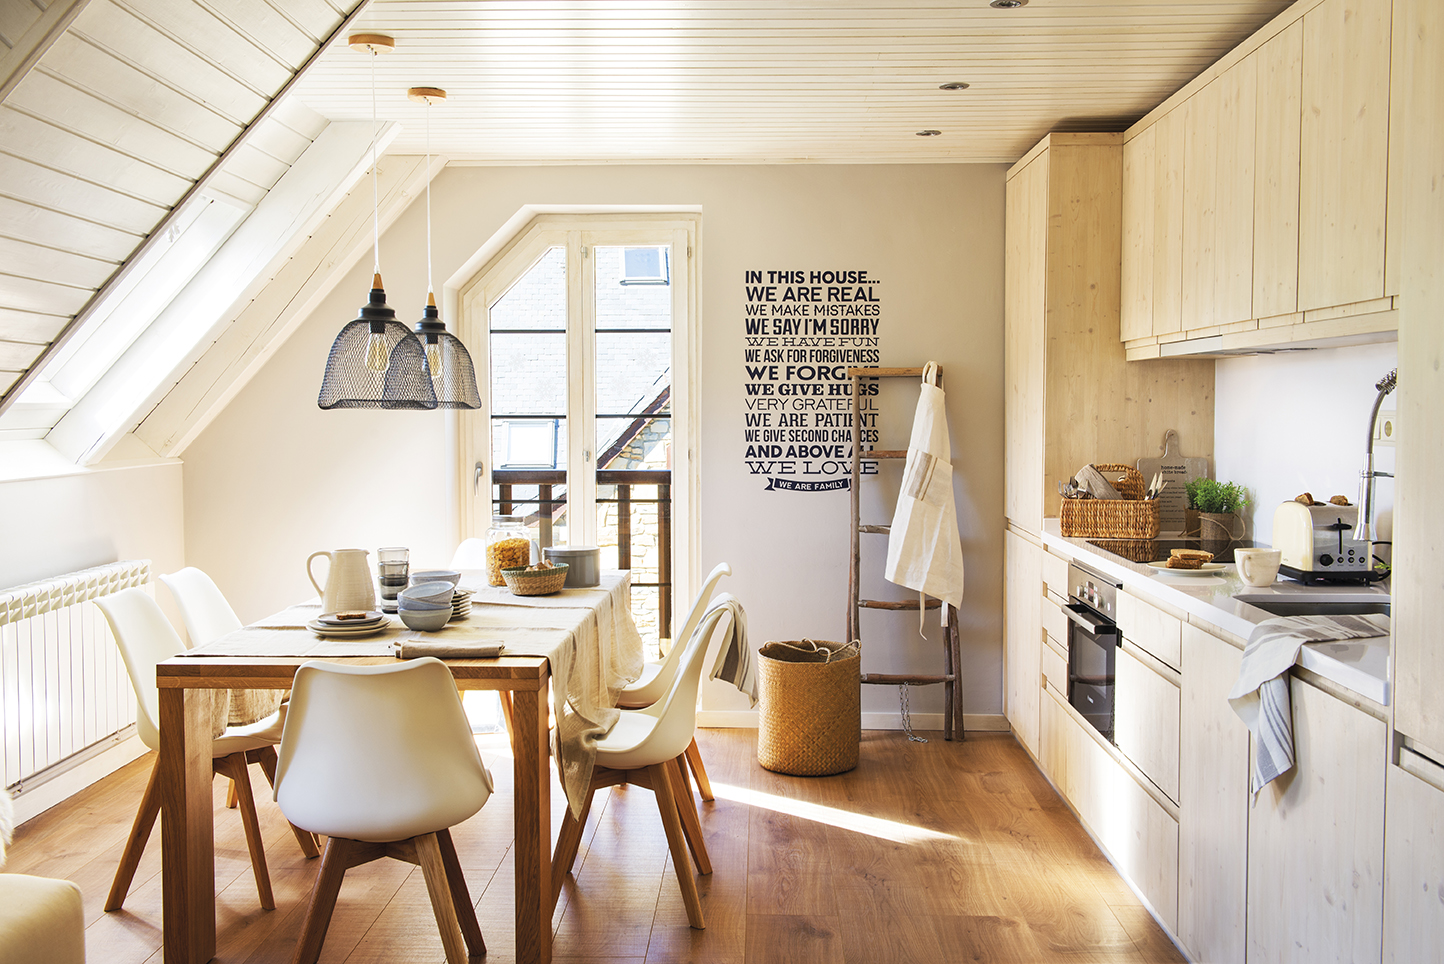 cocina con office escalera de pared decorativa vinilo lmparas de sobremesa sillas